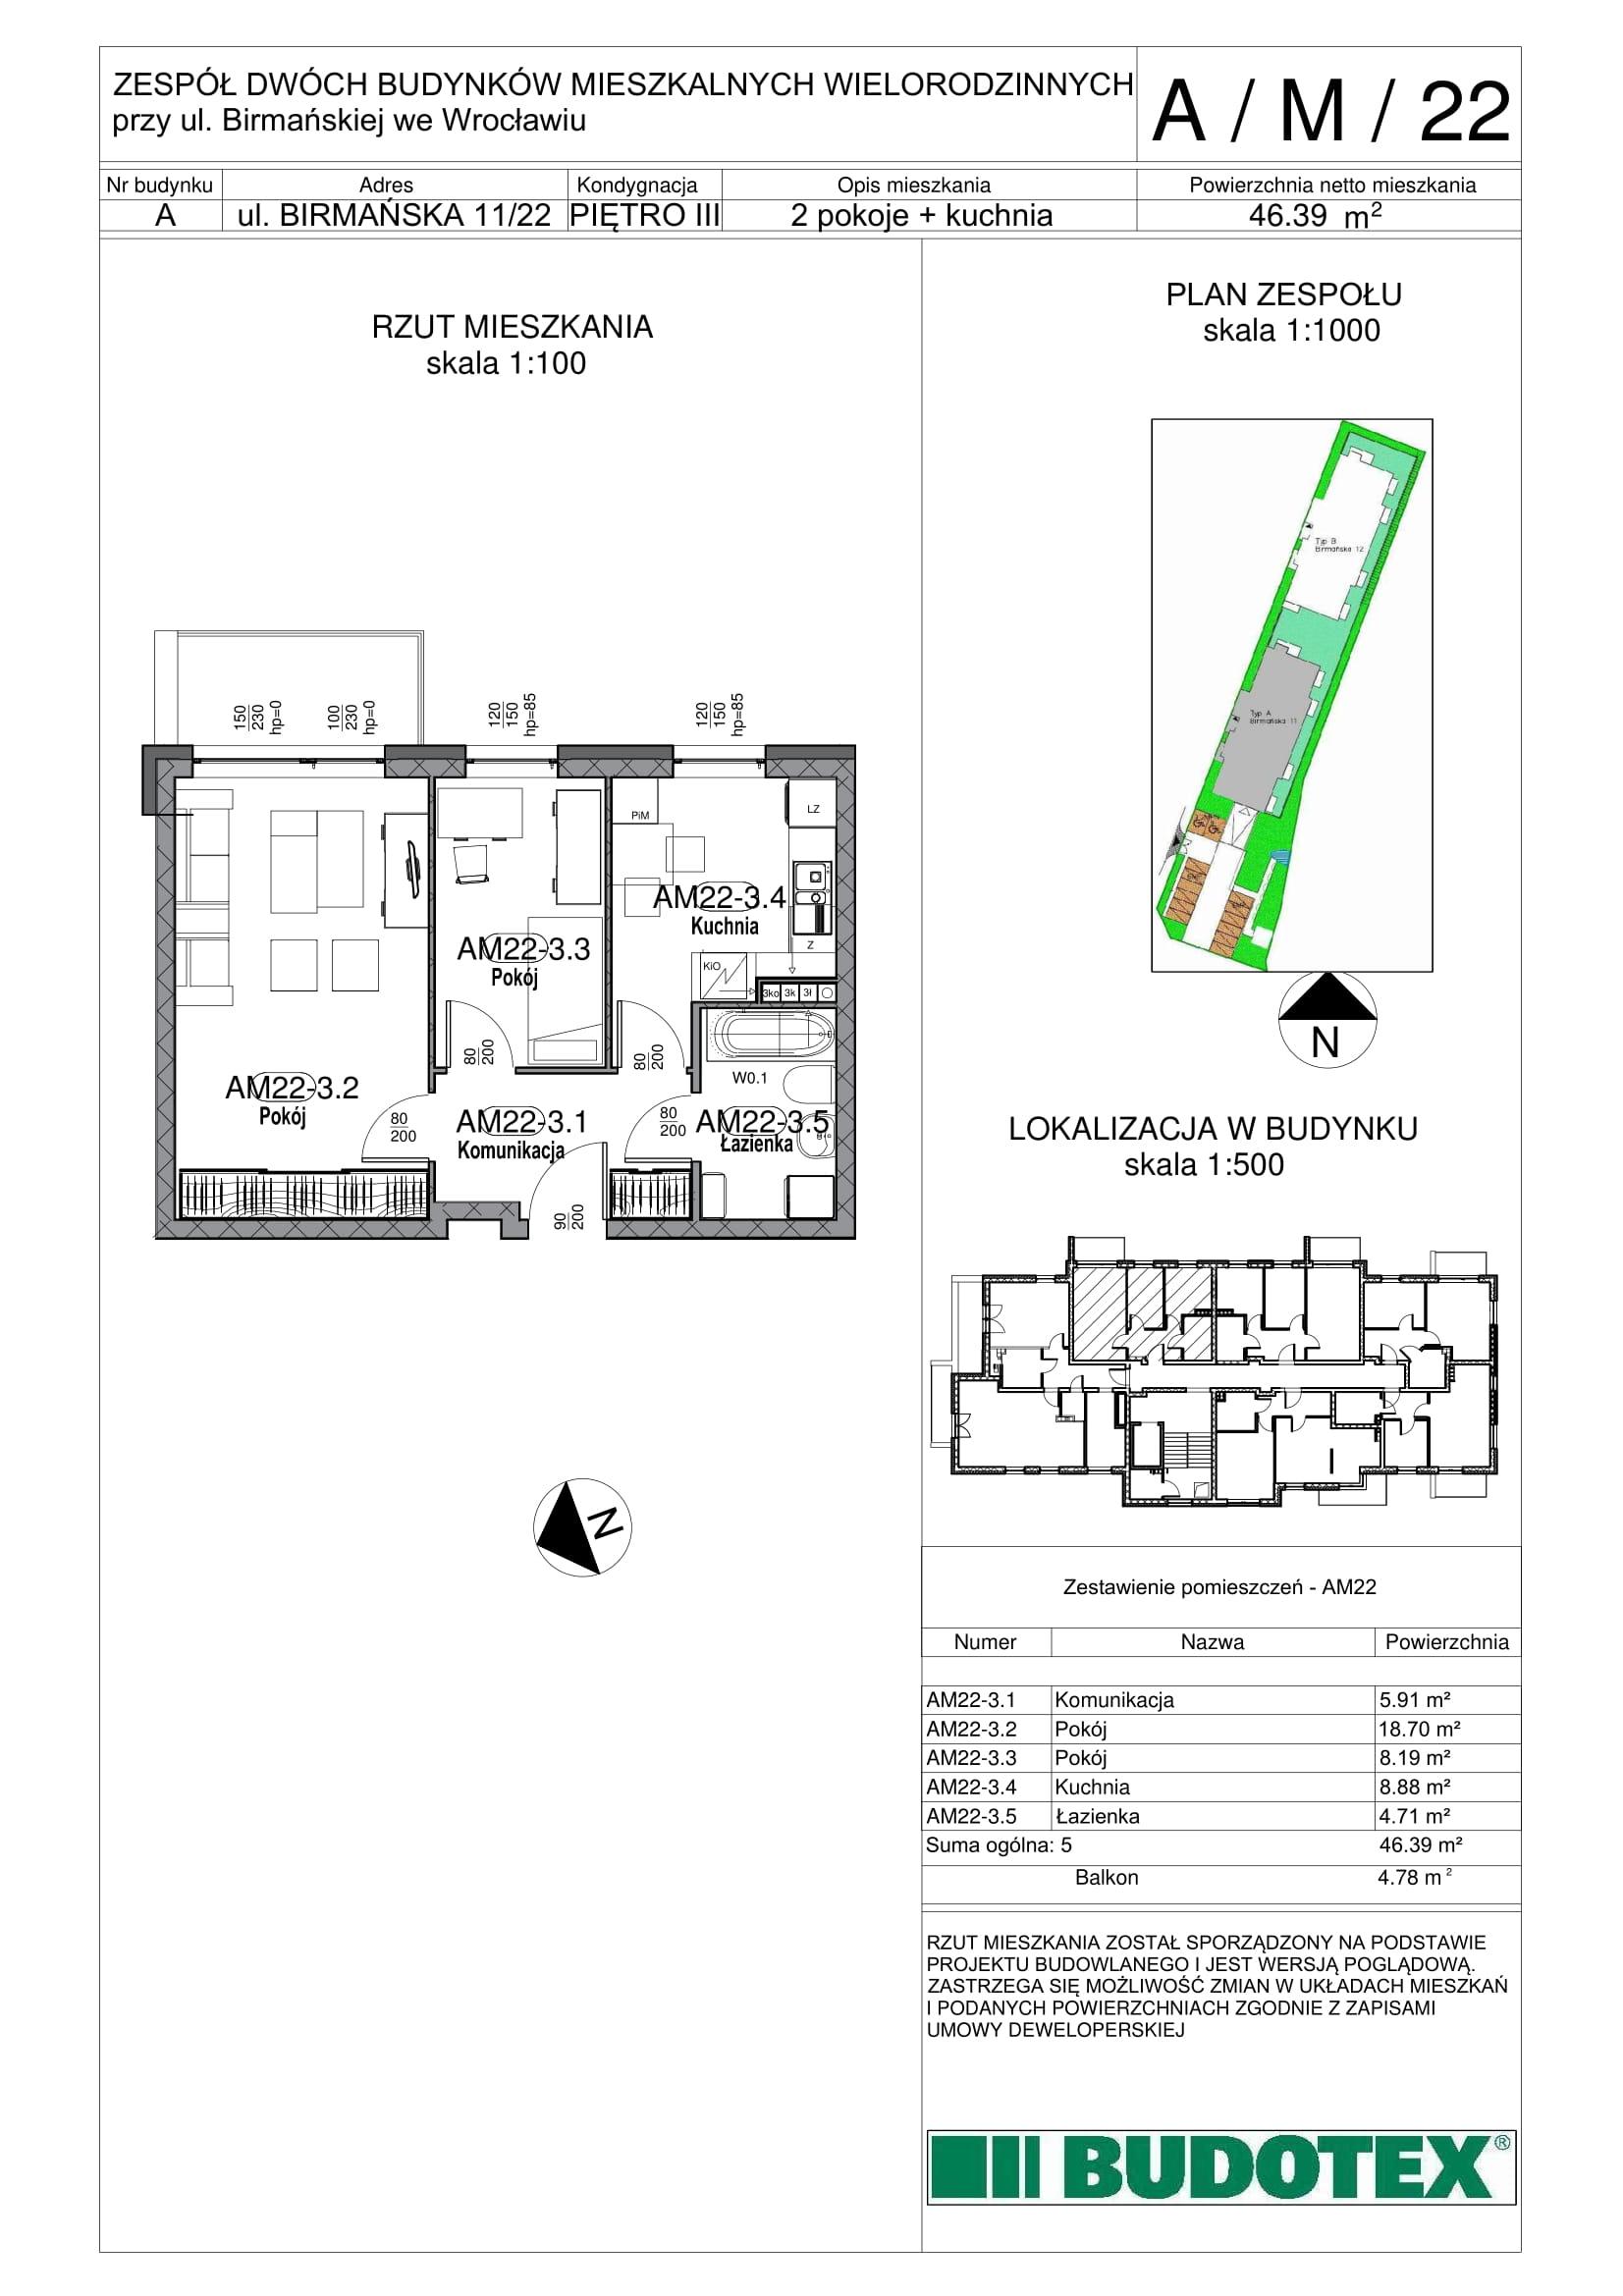 Mieszkanie nr A/M/22